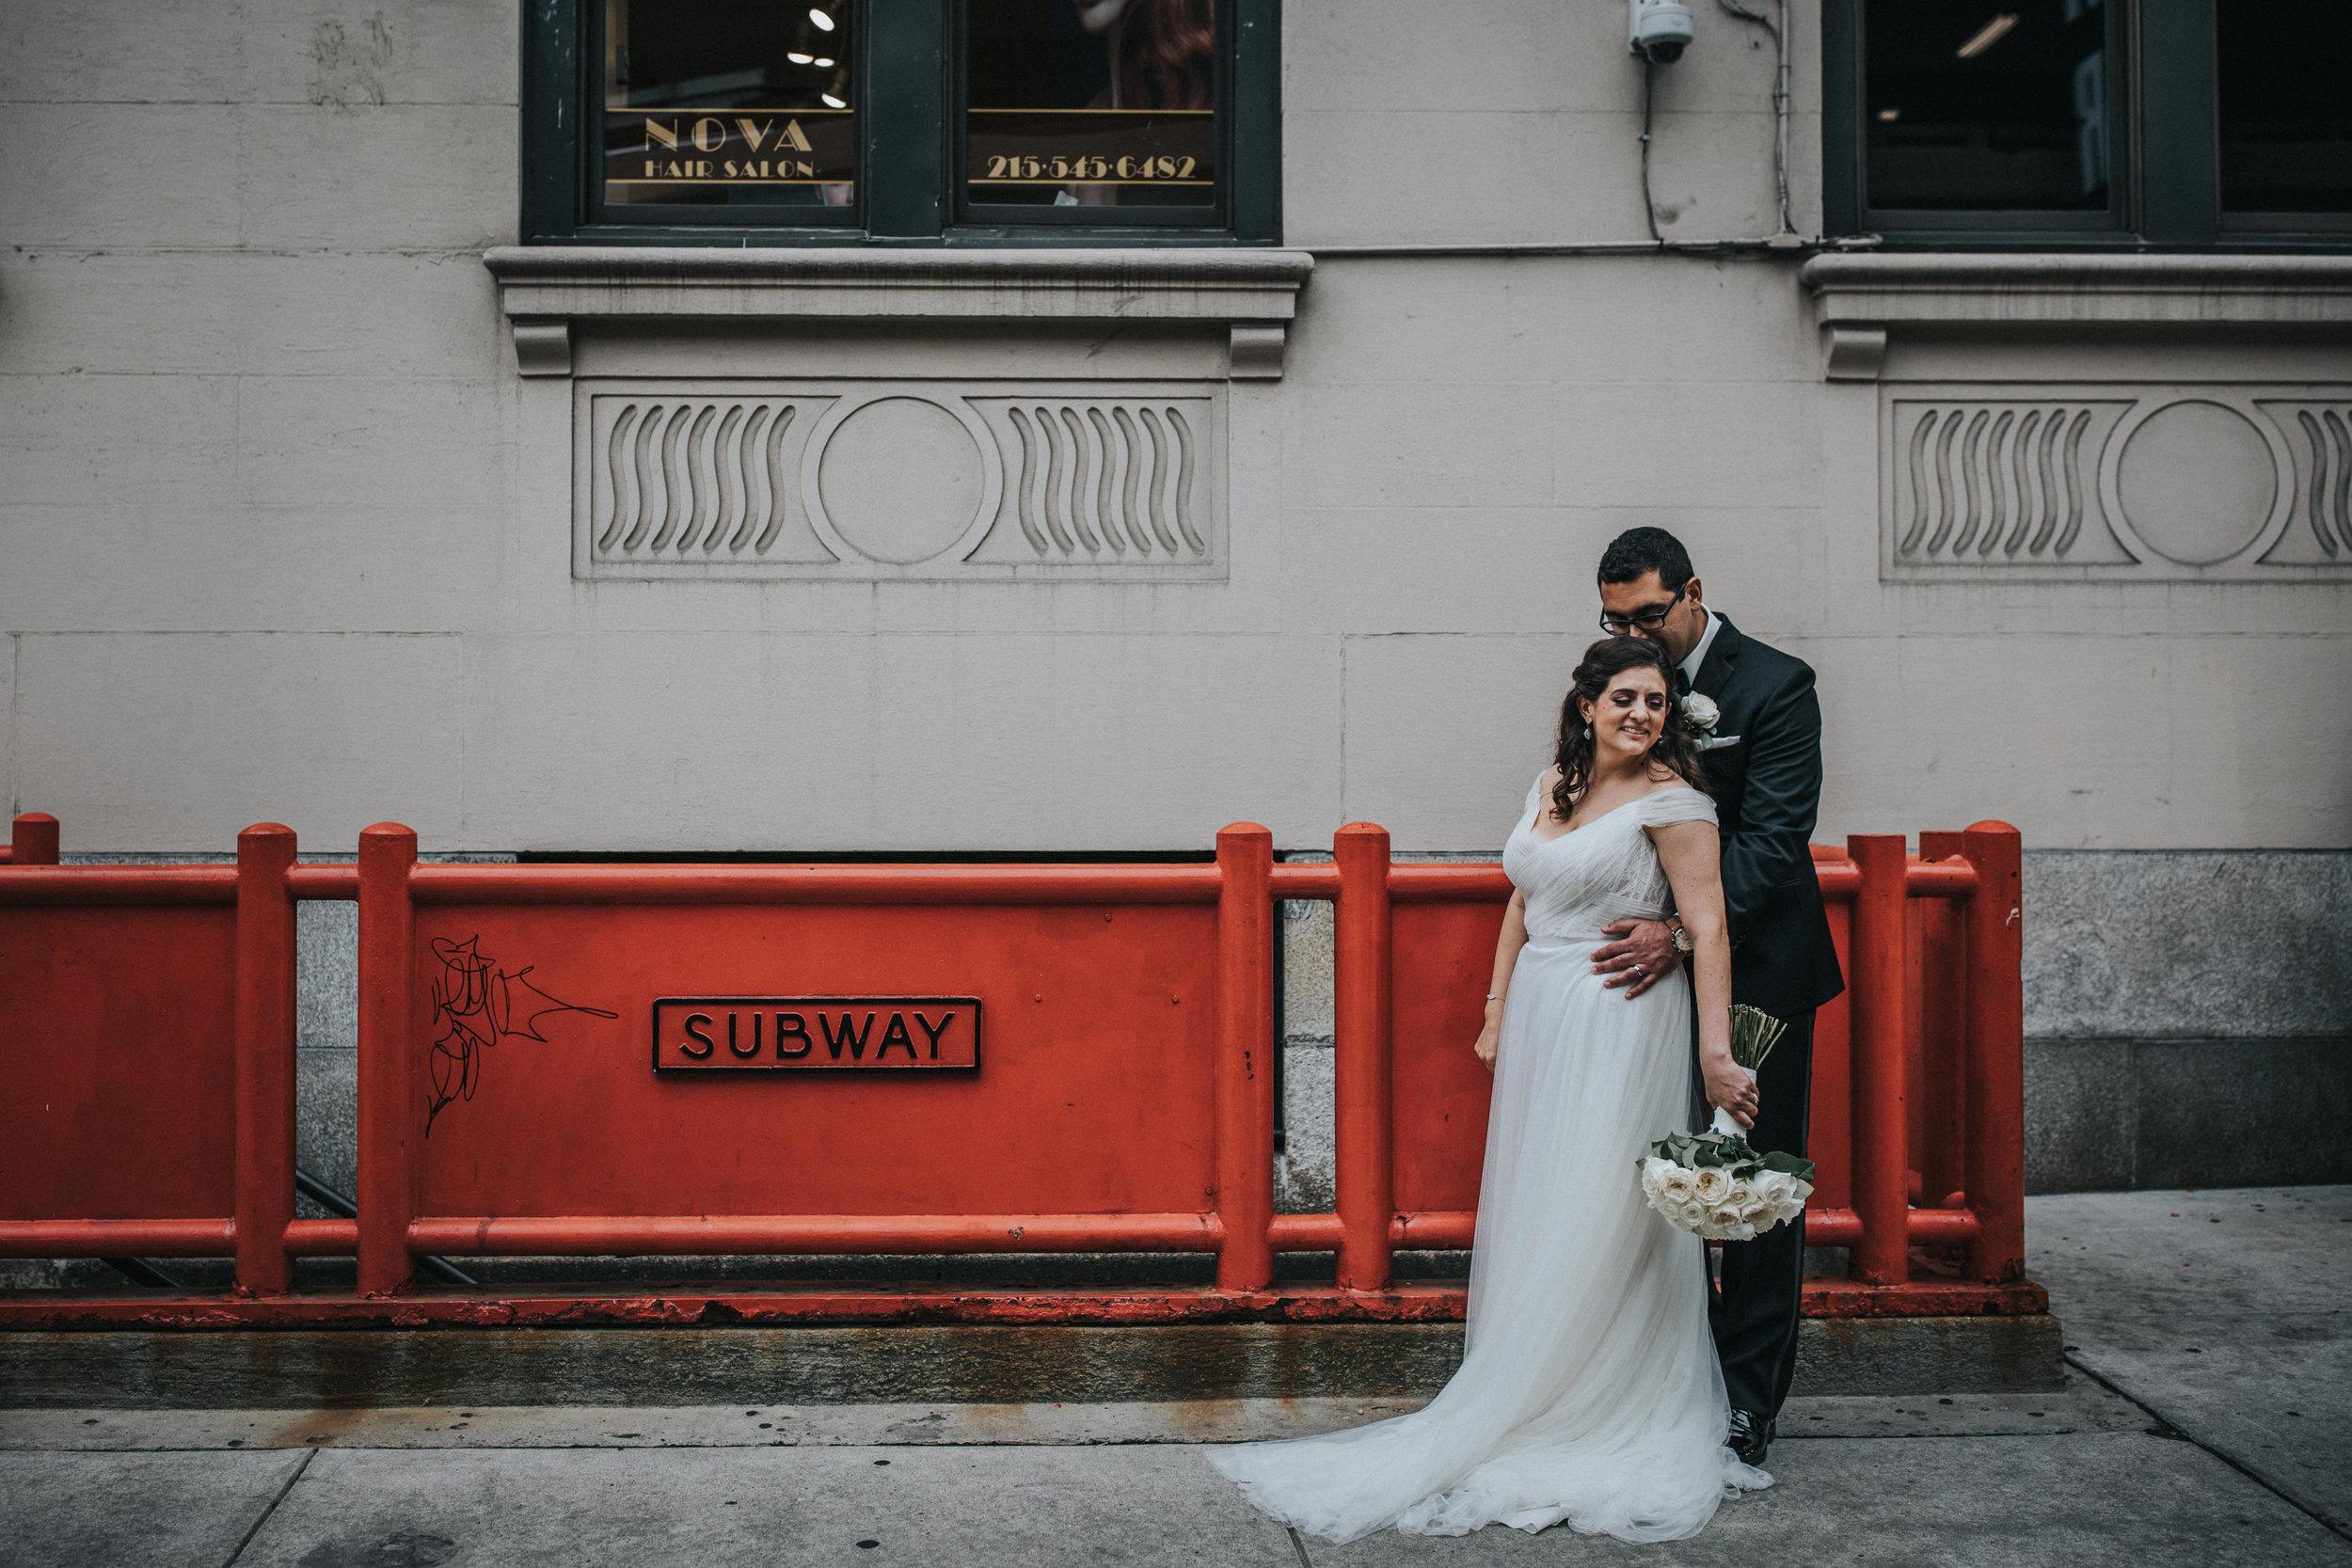 JennaLynnPhotography-NJWeddingPhotographer-Philadelphia-Wedding-ArtsBallroom-BridalParty-43.jpg